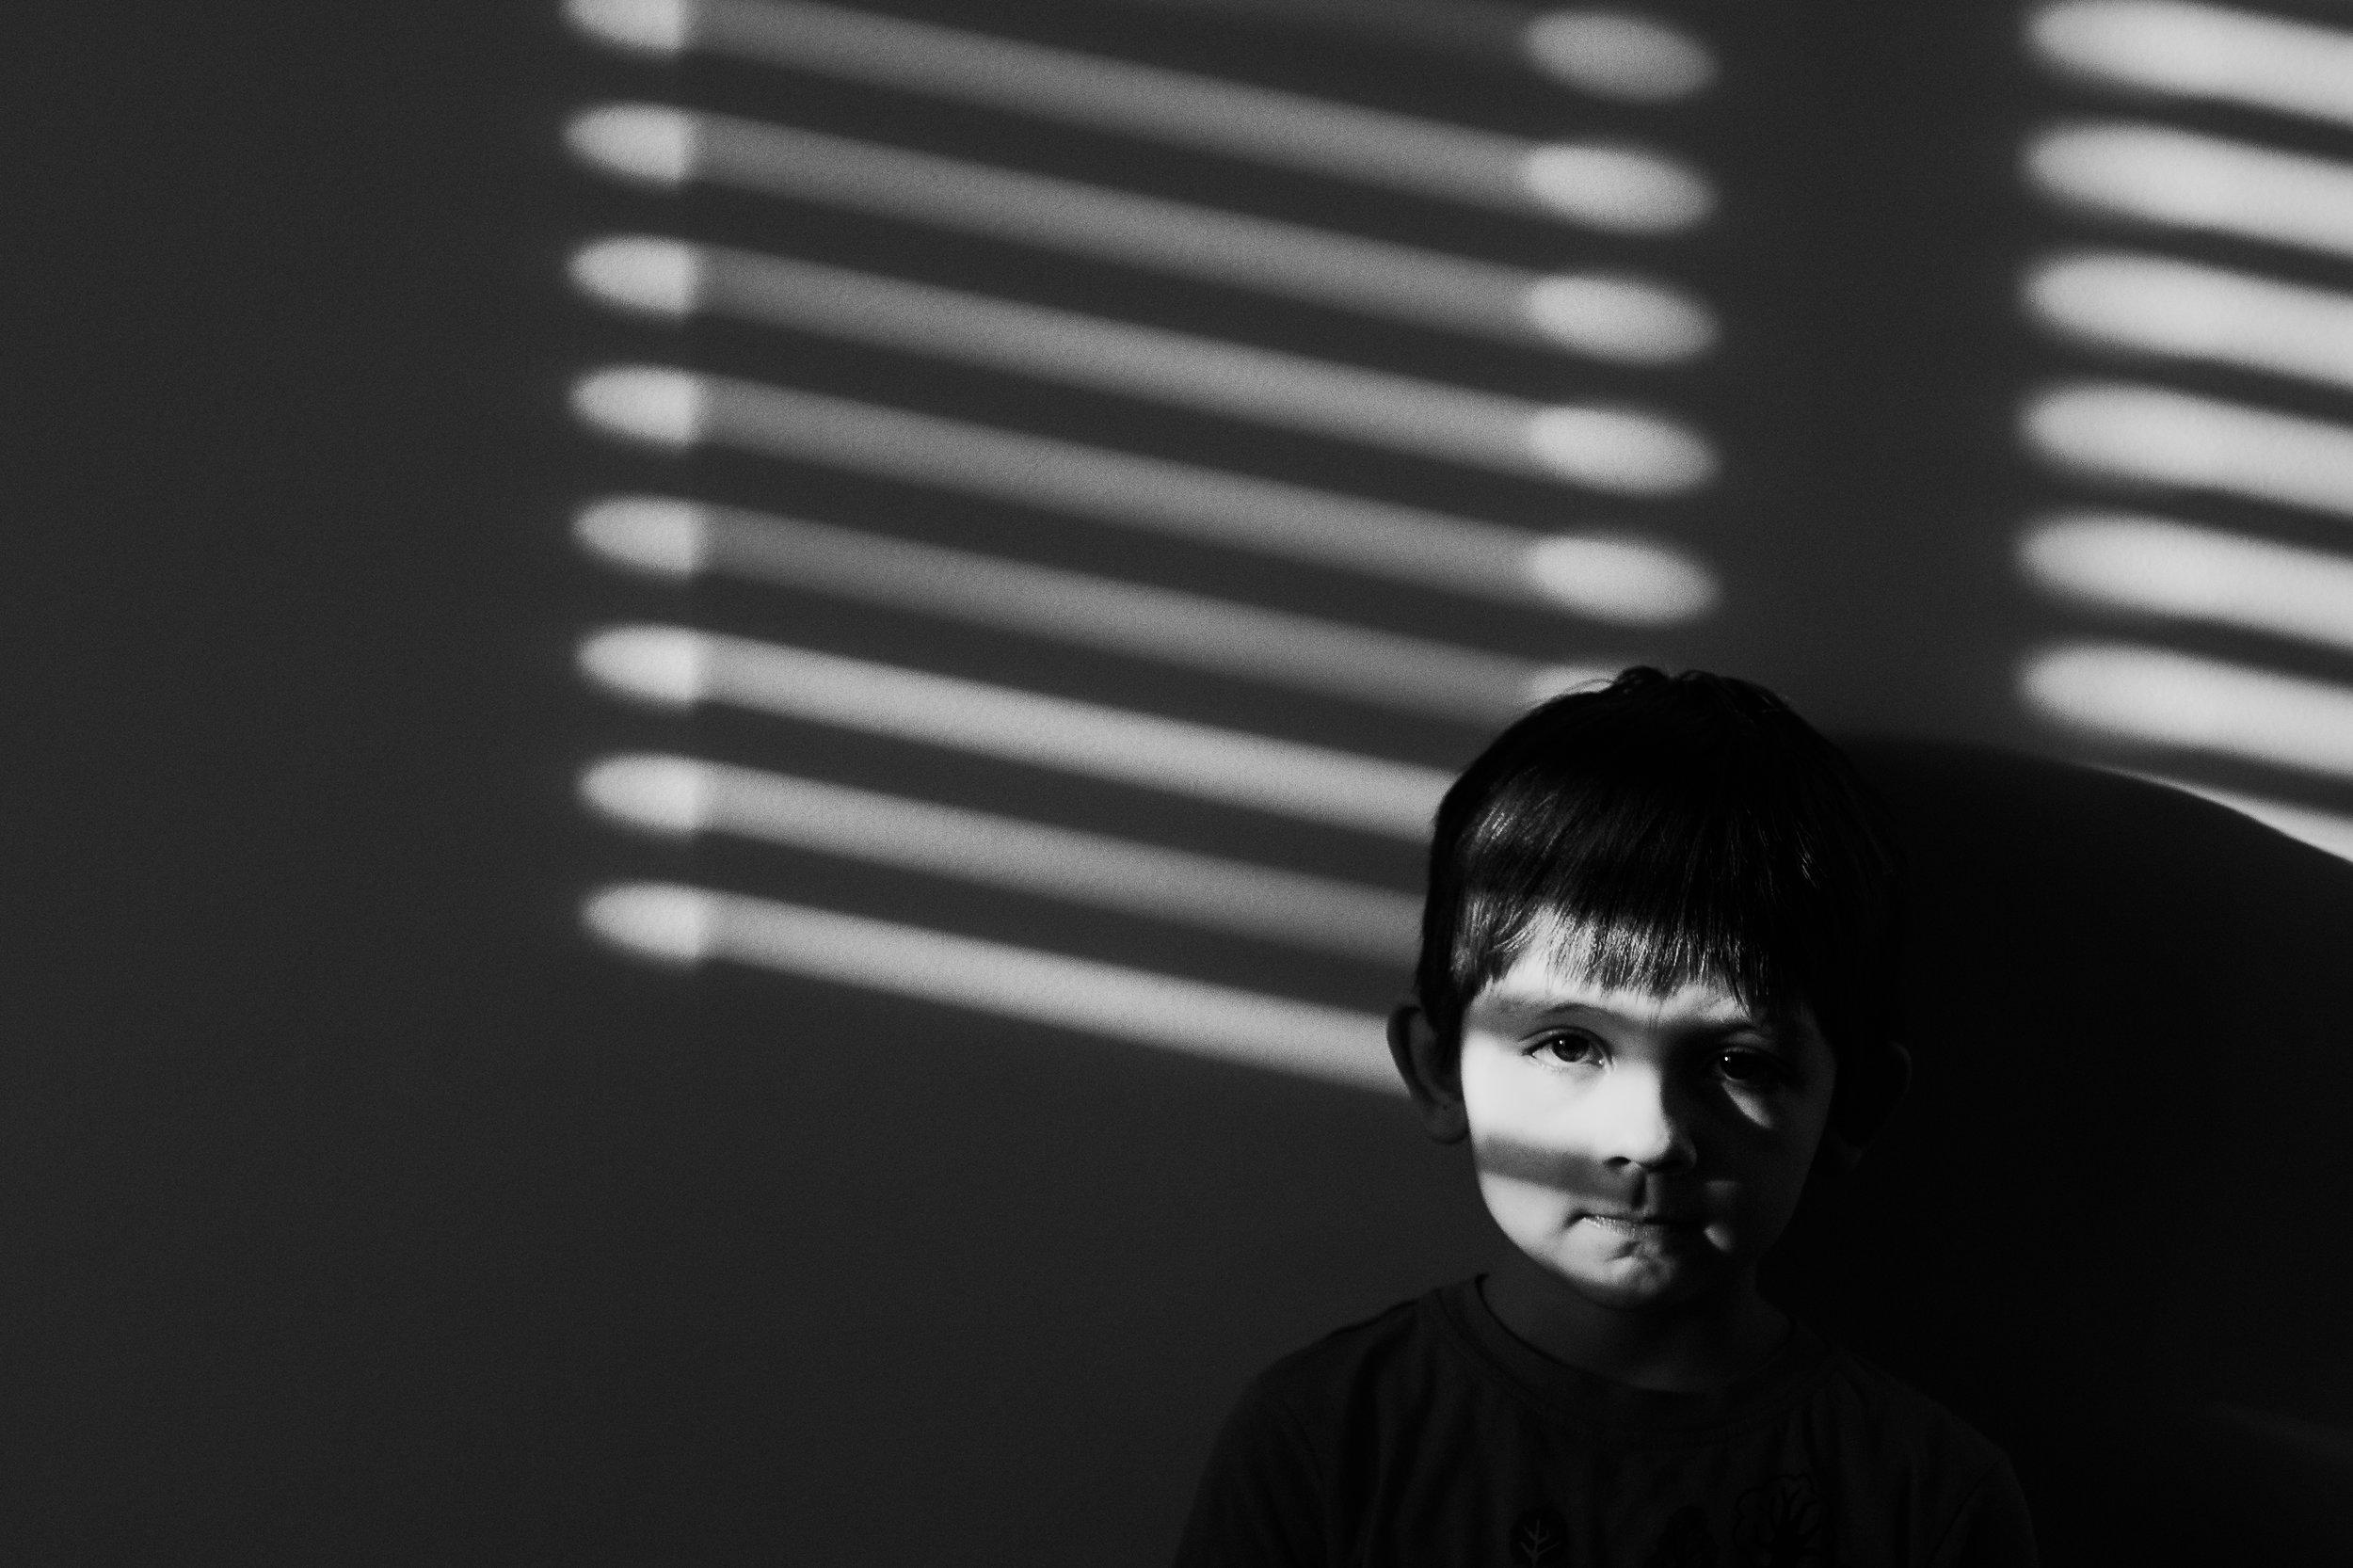 Shutters & Shadows Winter Home 04.jpg